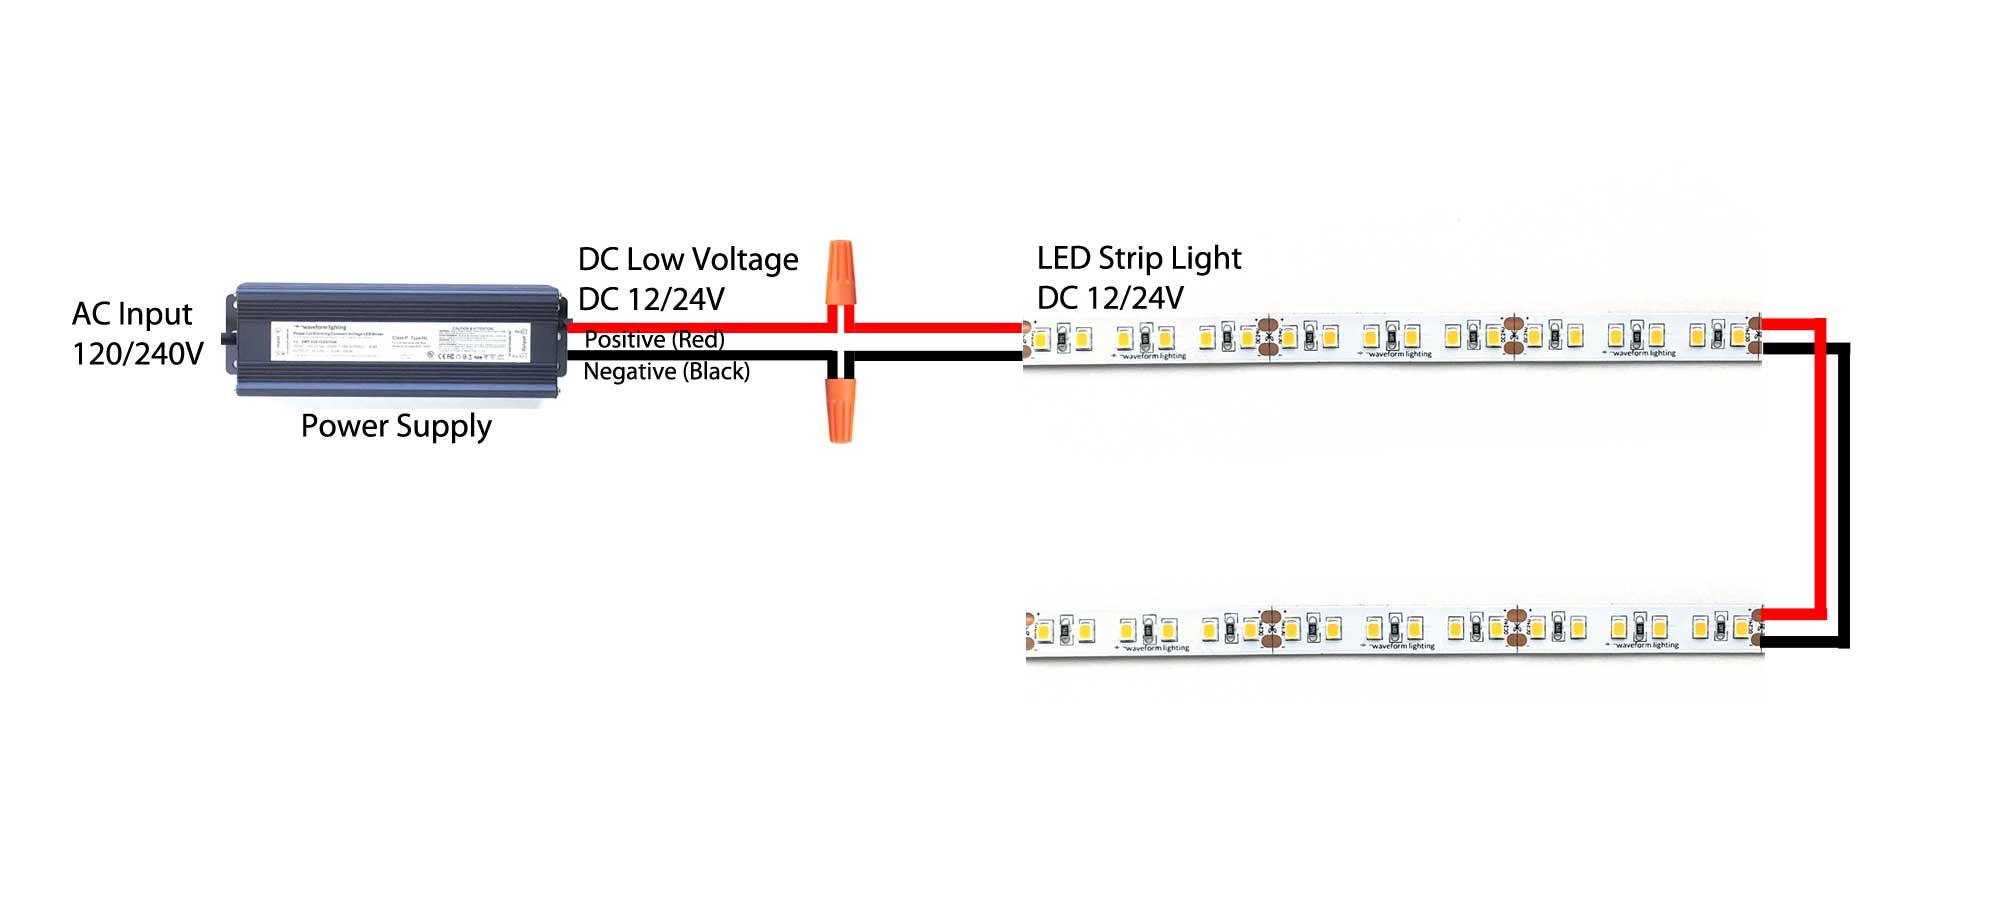 waveform lighting